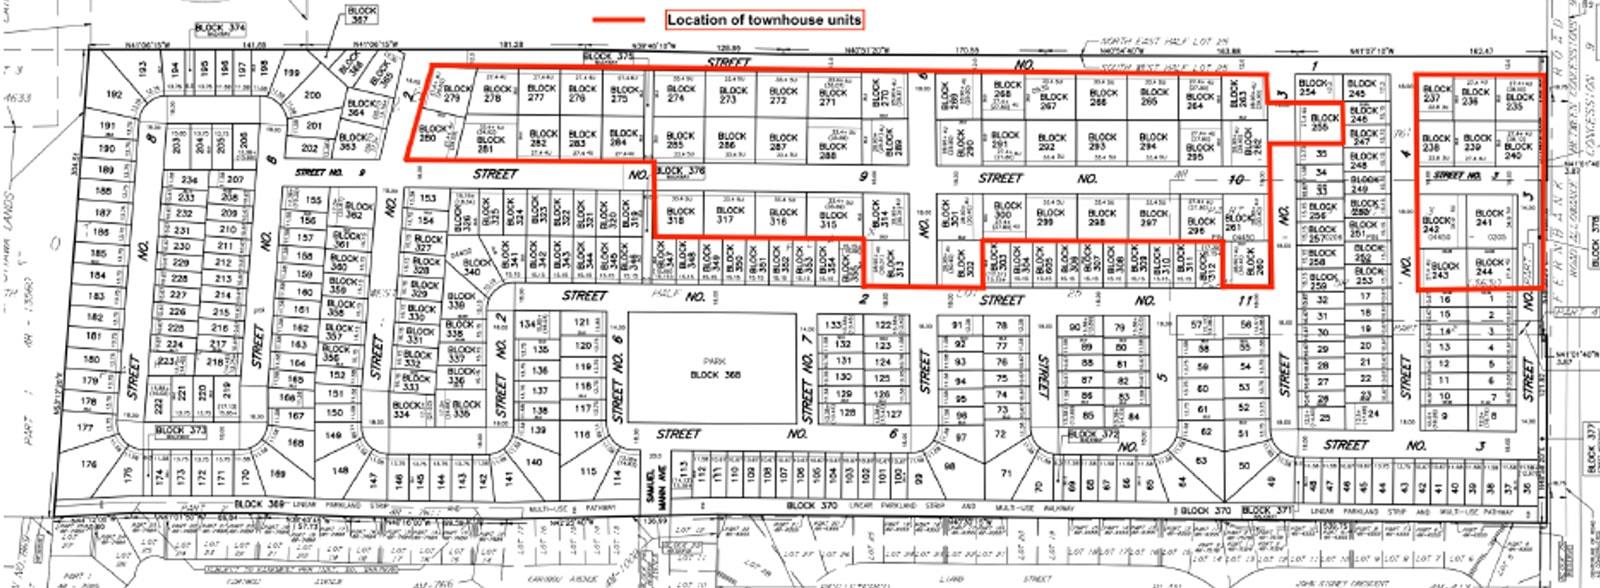 6015 Fernbank site plan